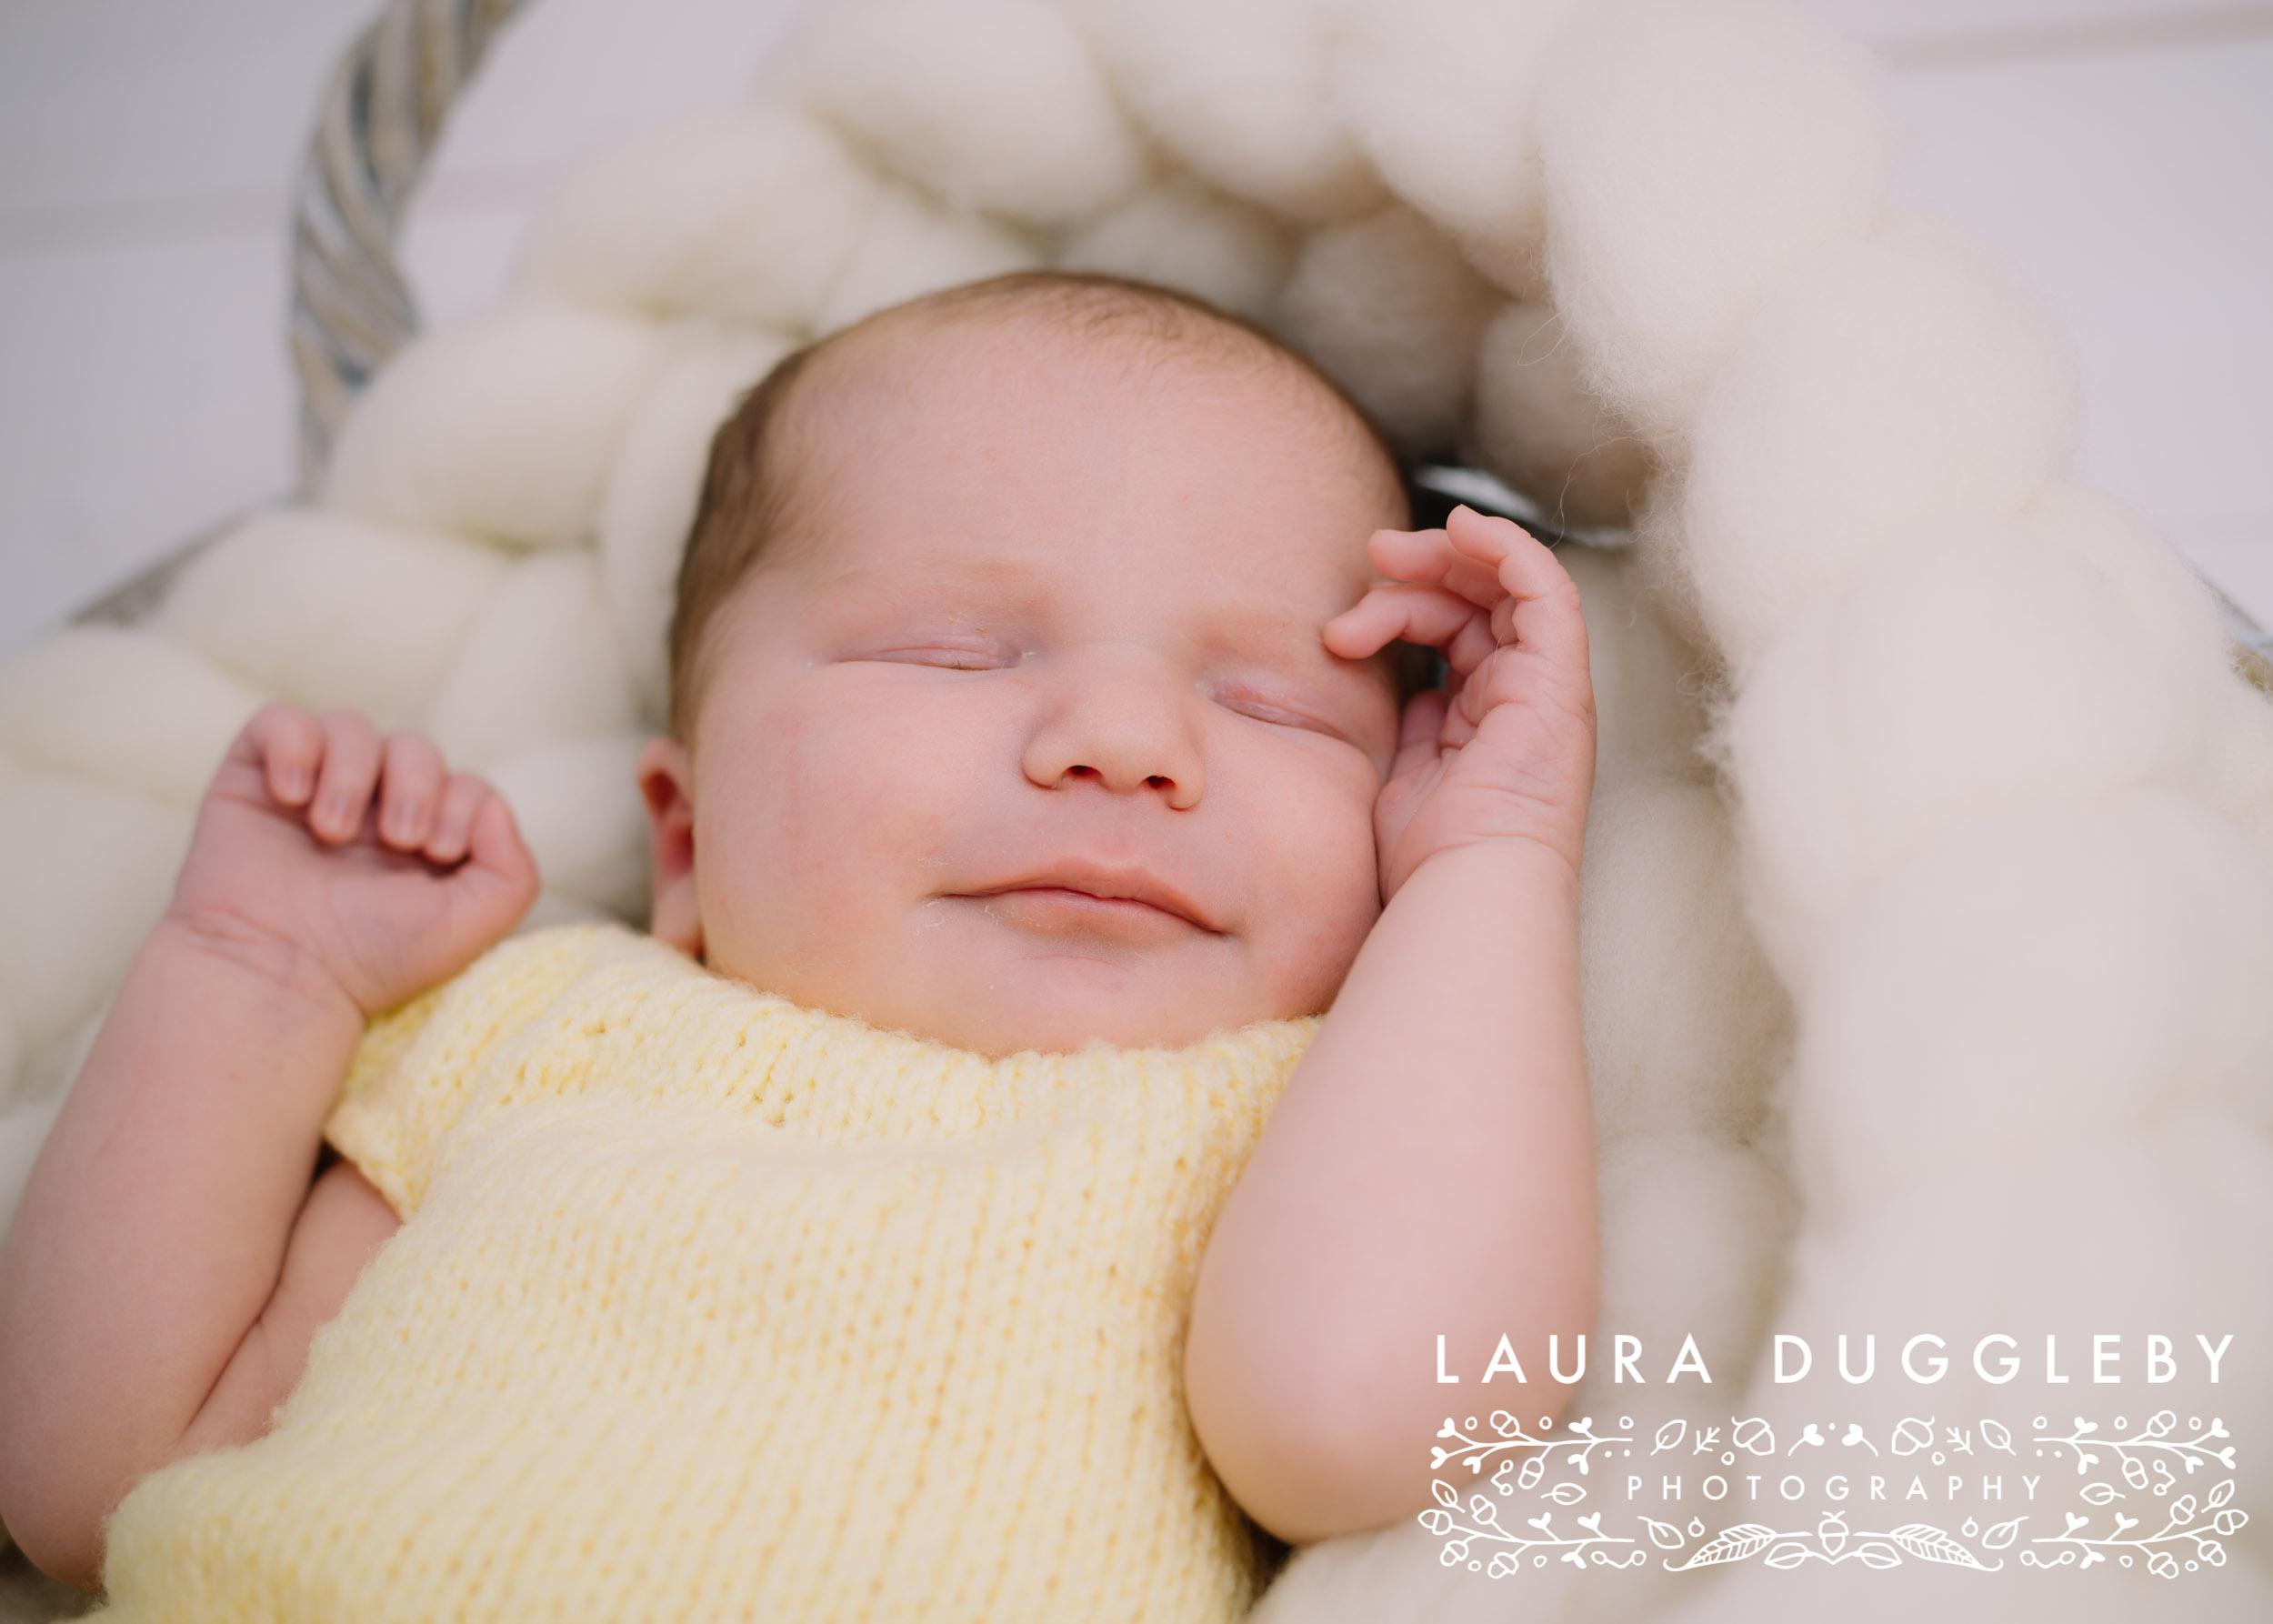 NewbornPhotography Session Lancashire-12.jpg